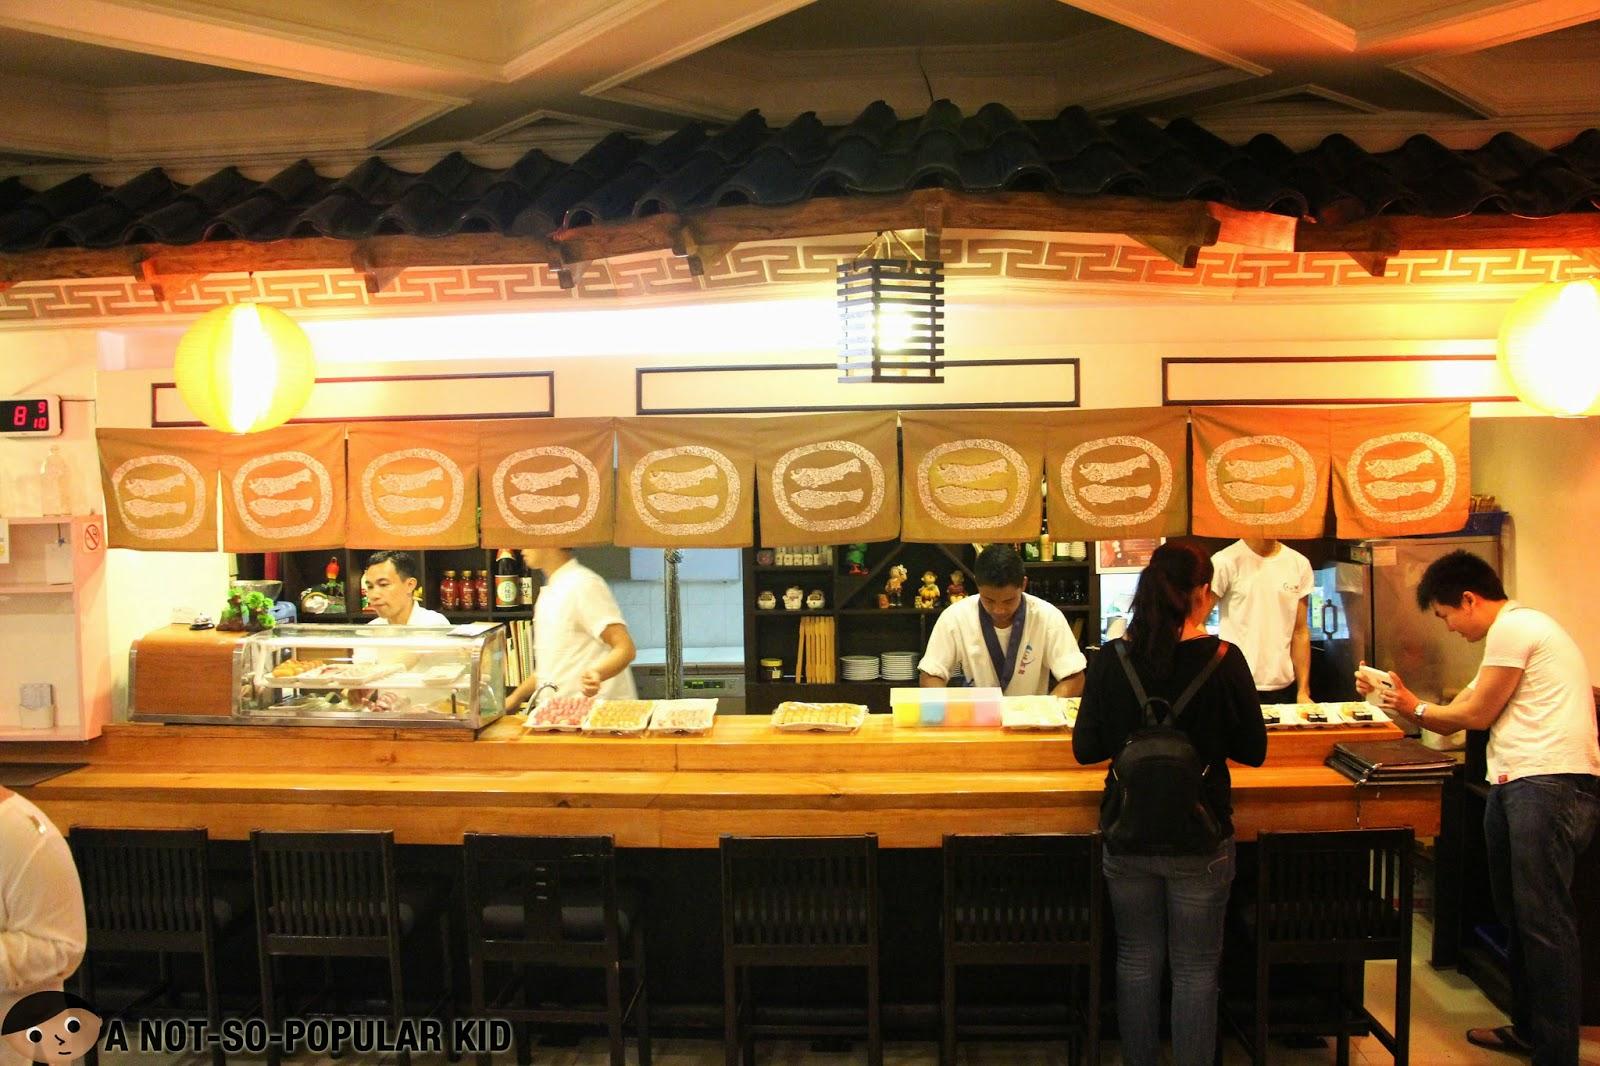 Genji-M in Makati - Sushi chefs